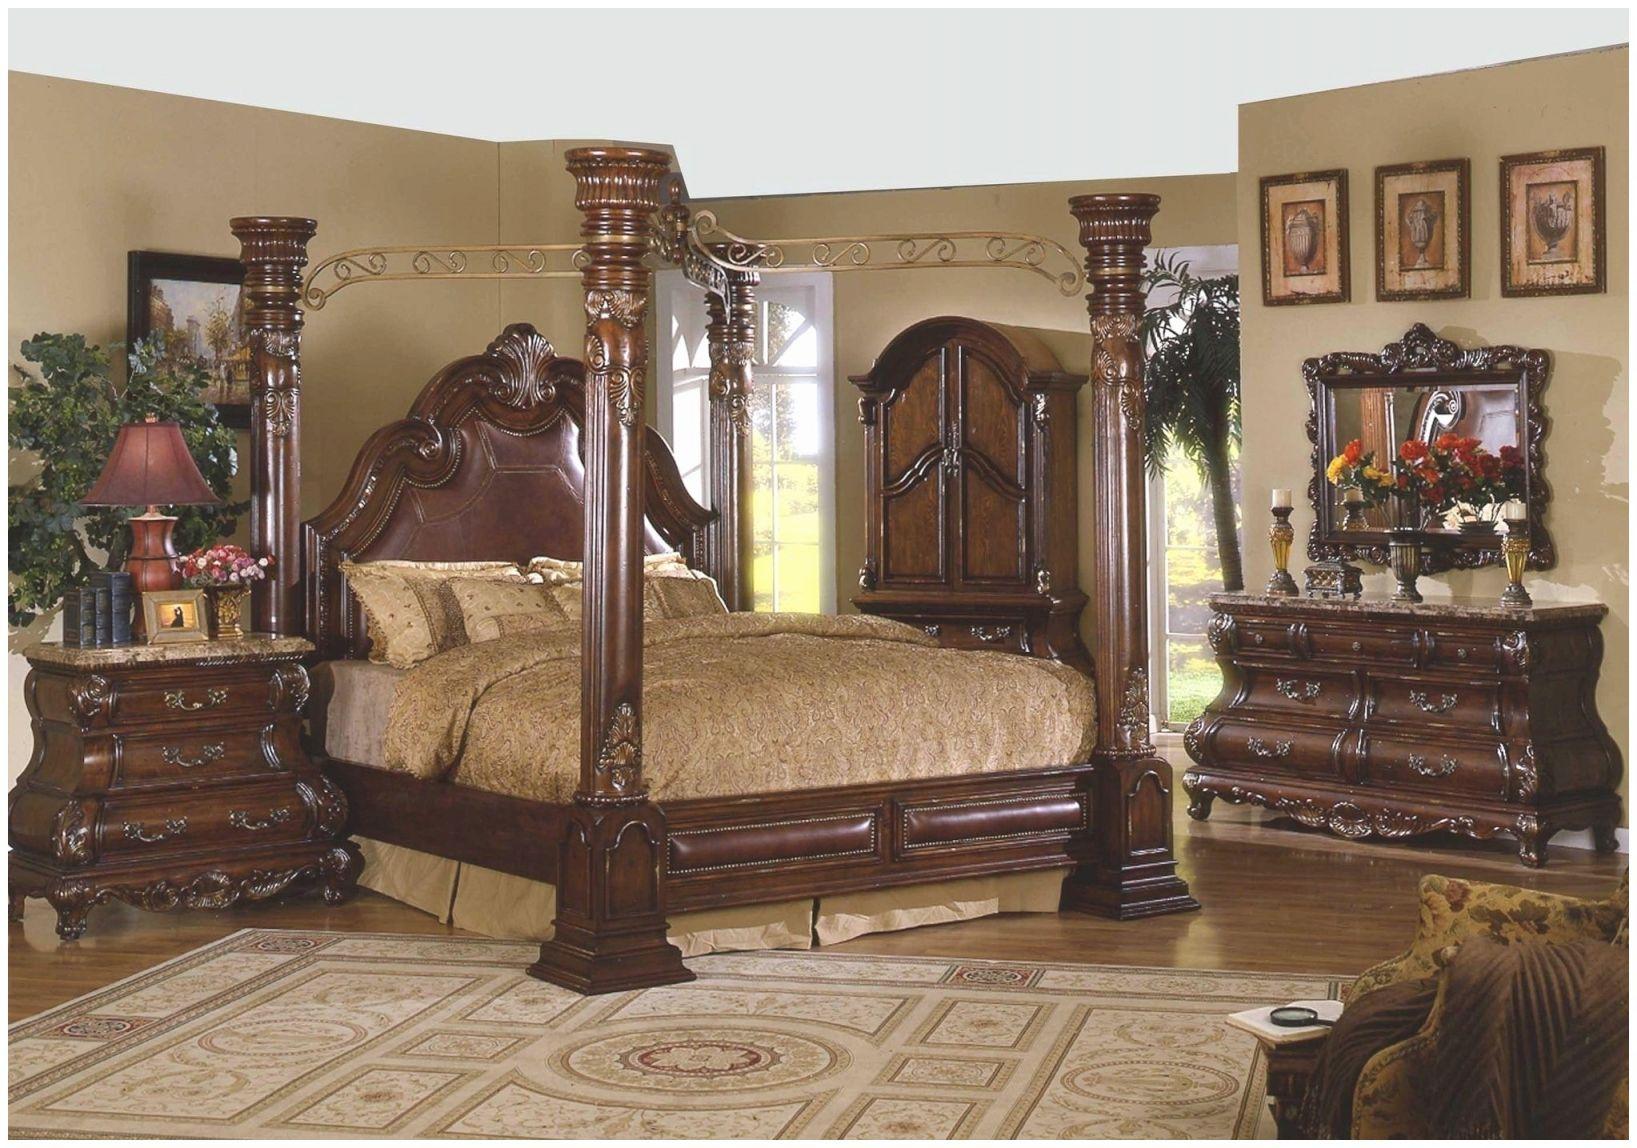 Luxury El Dorado Furniture Living Room Sets - Awesome Decors